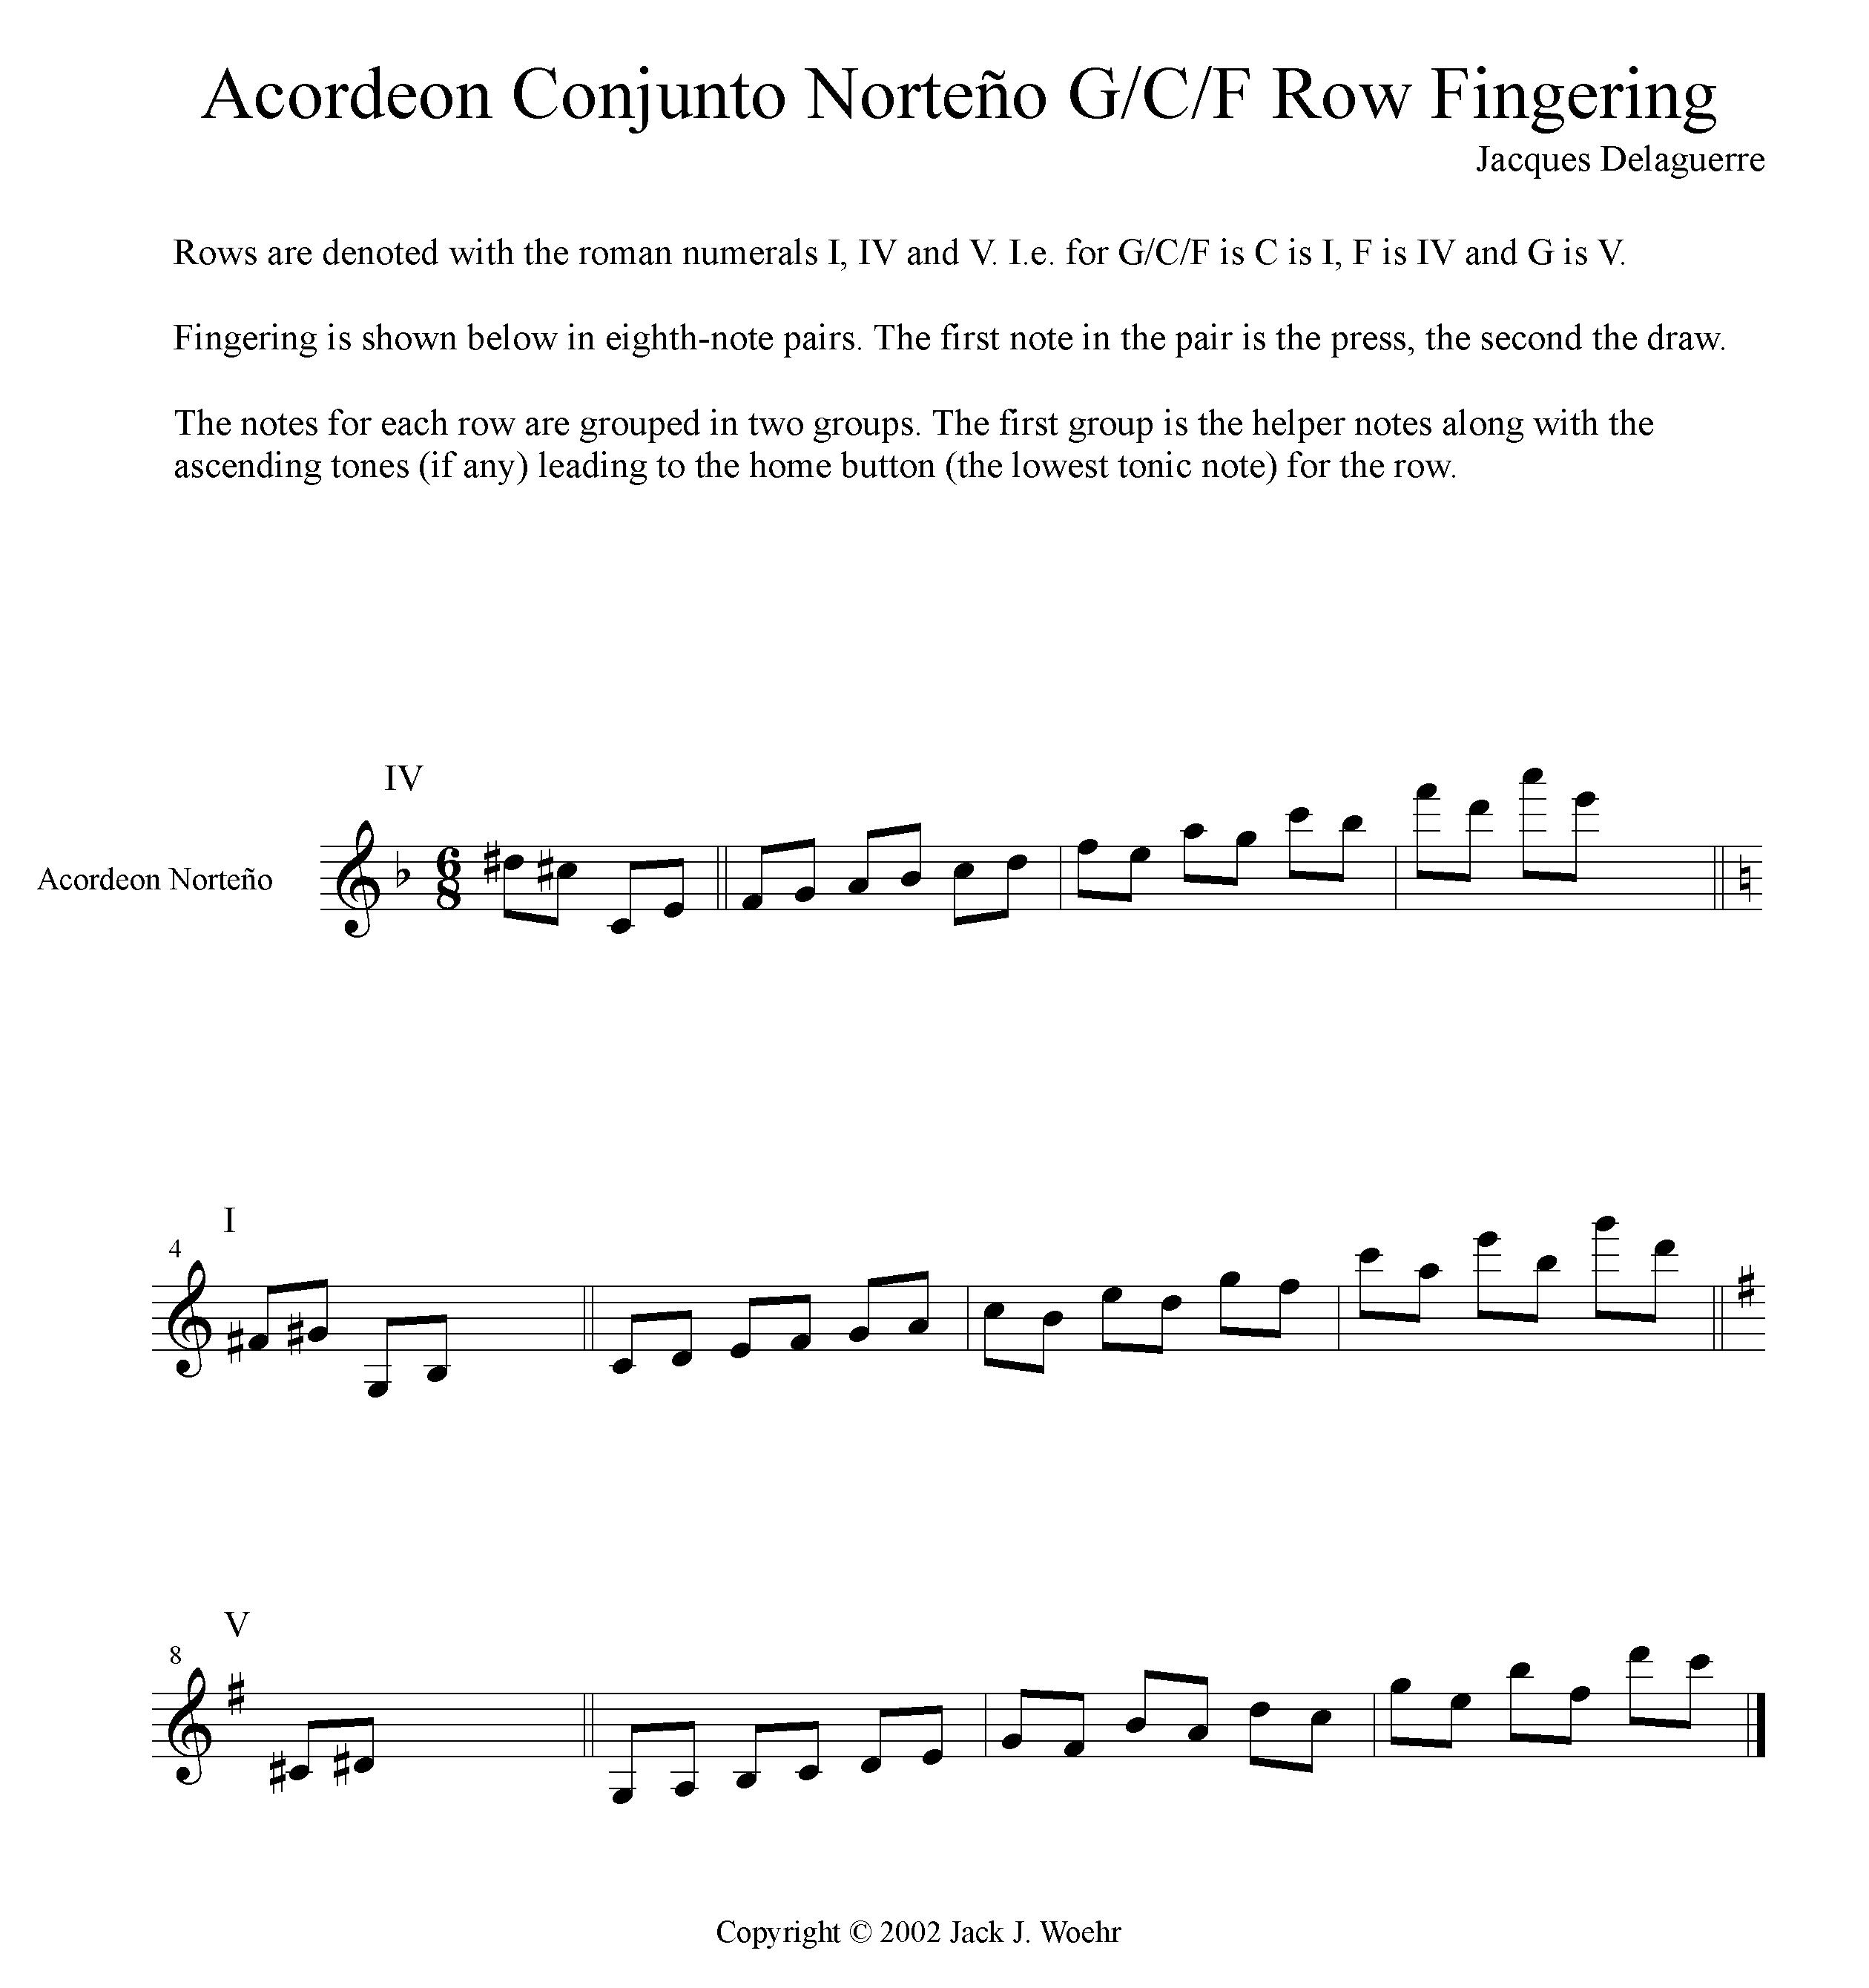 Musicians Guide To Acordeon Conjunto Norteo Notes And Scales